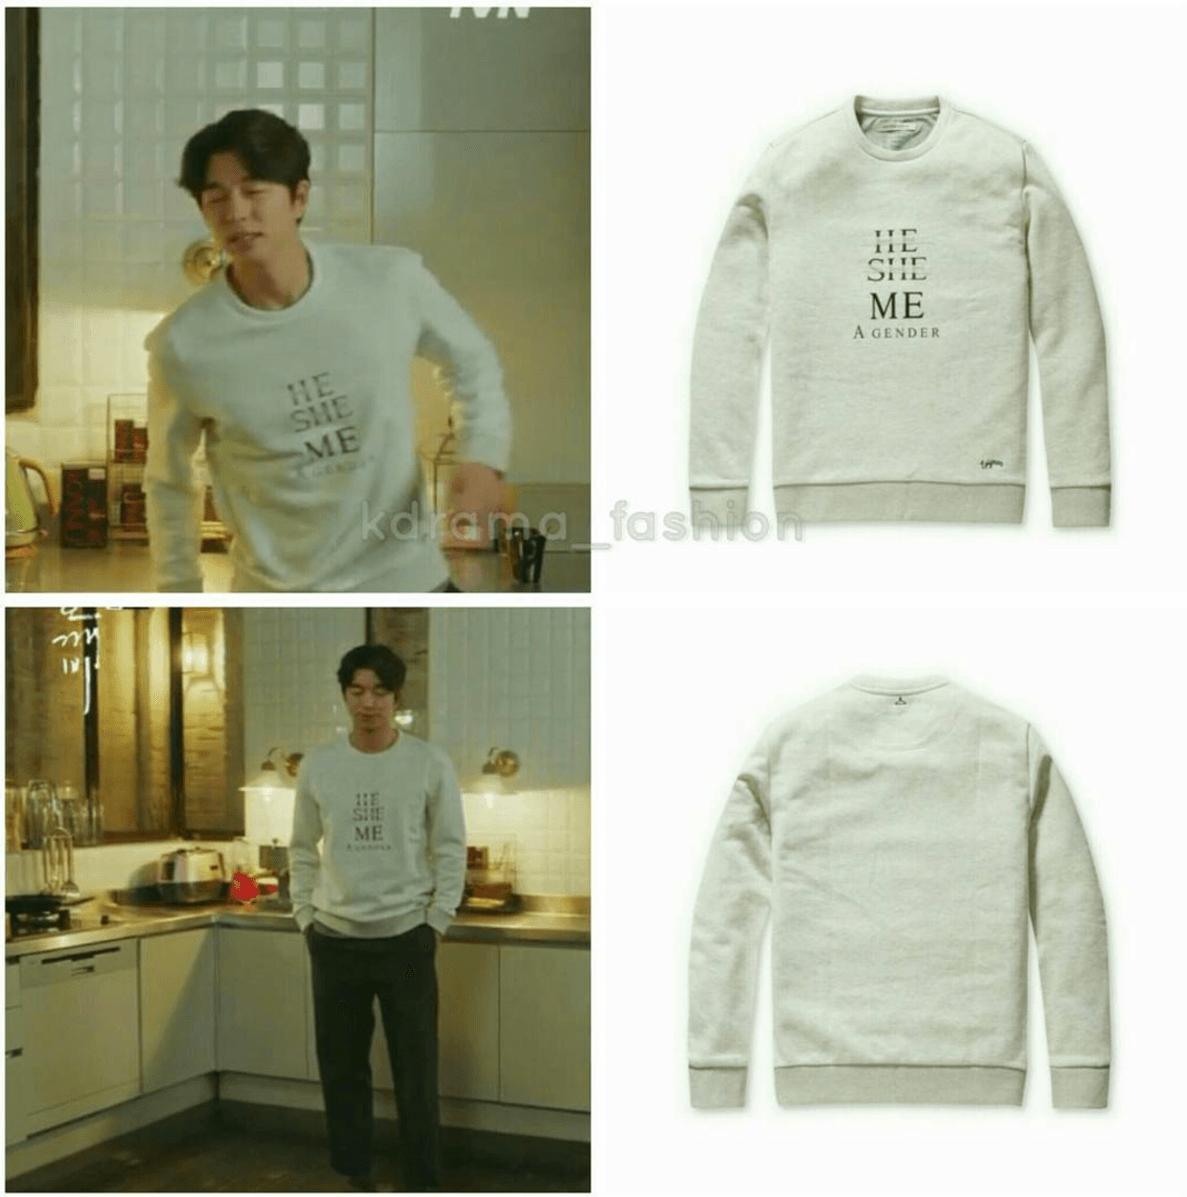 epigram-typo-tape-point-sweatshirt